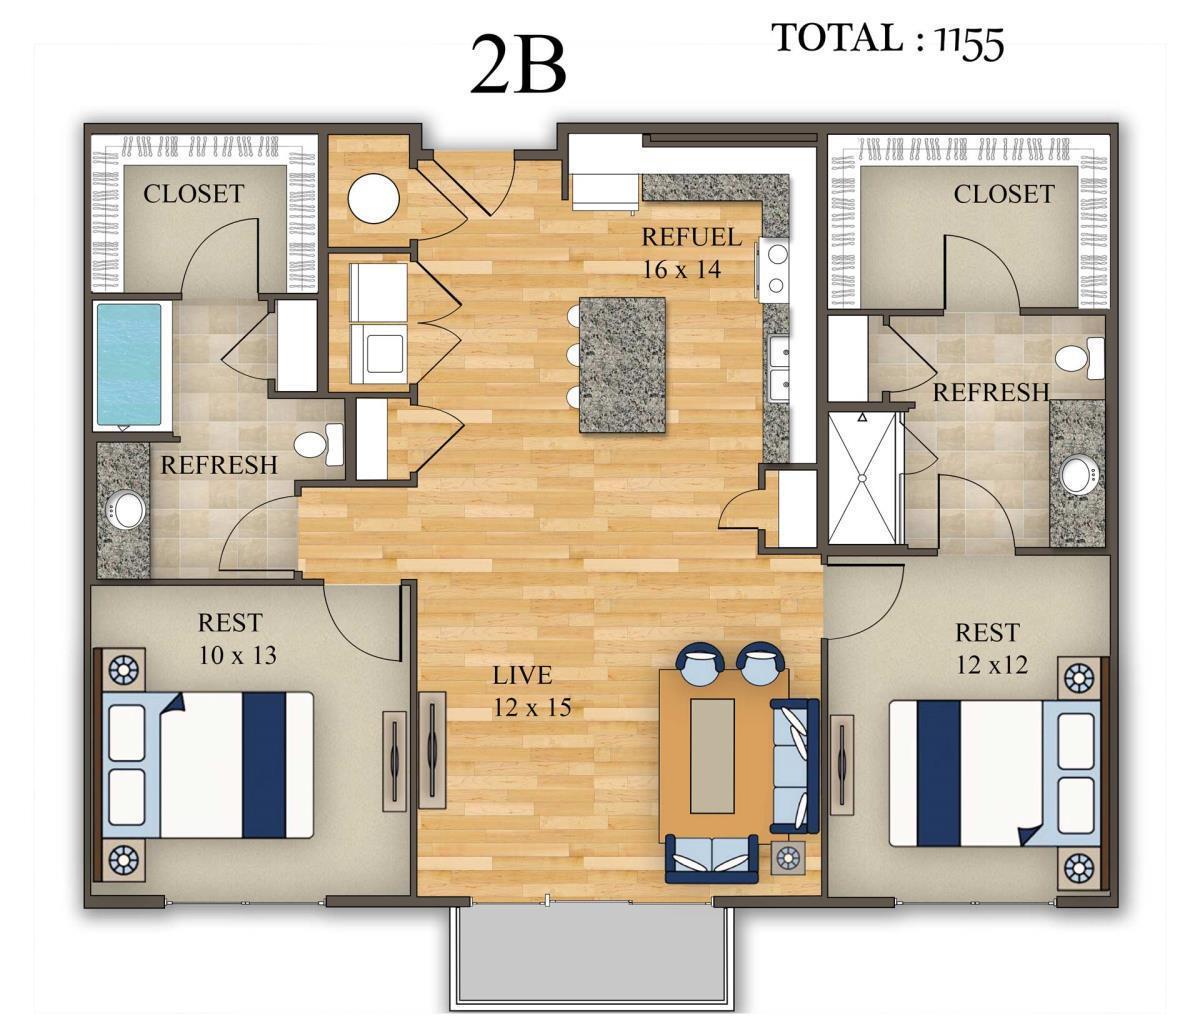 1,155 sq. ft. 2B floor plan